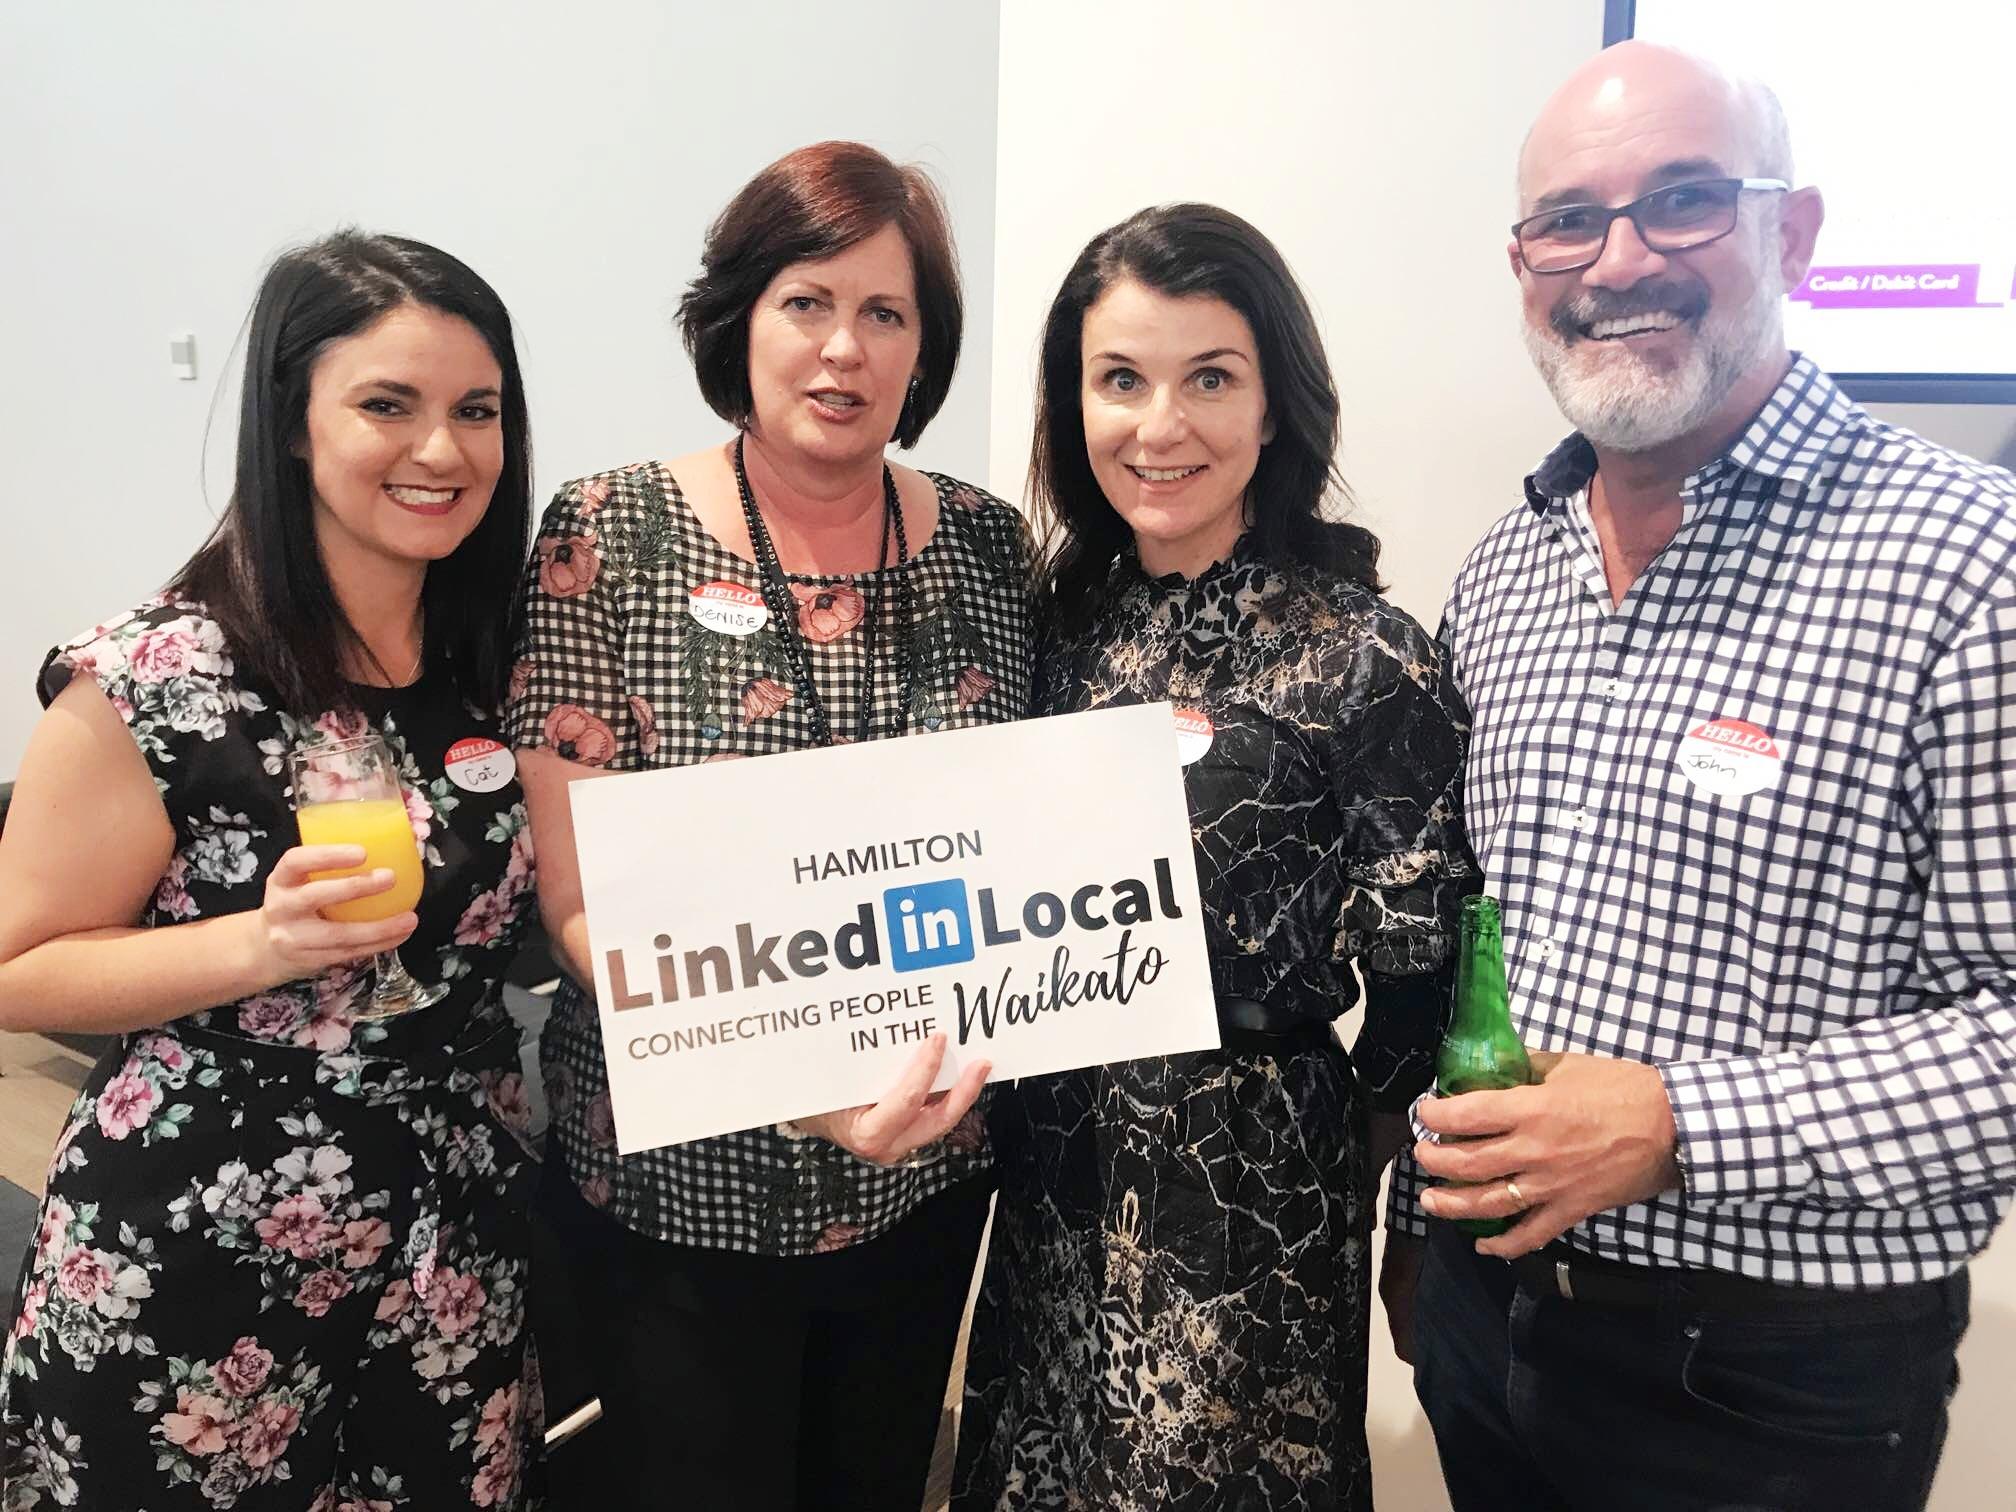 LinkedIn Local Hamilton